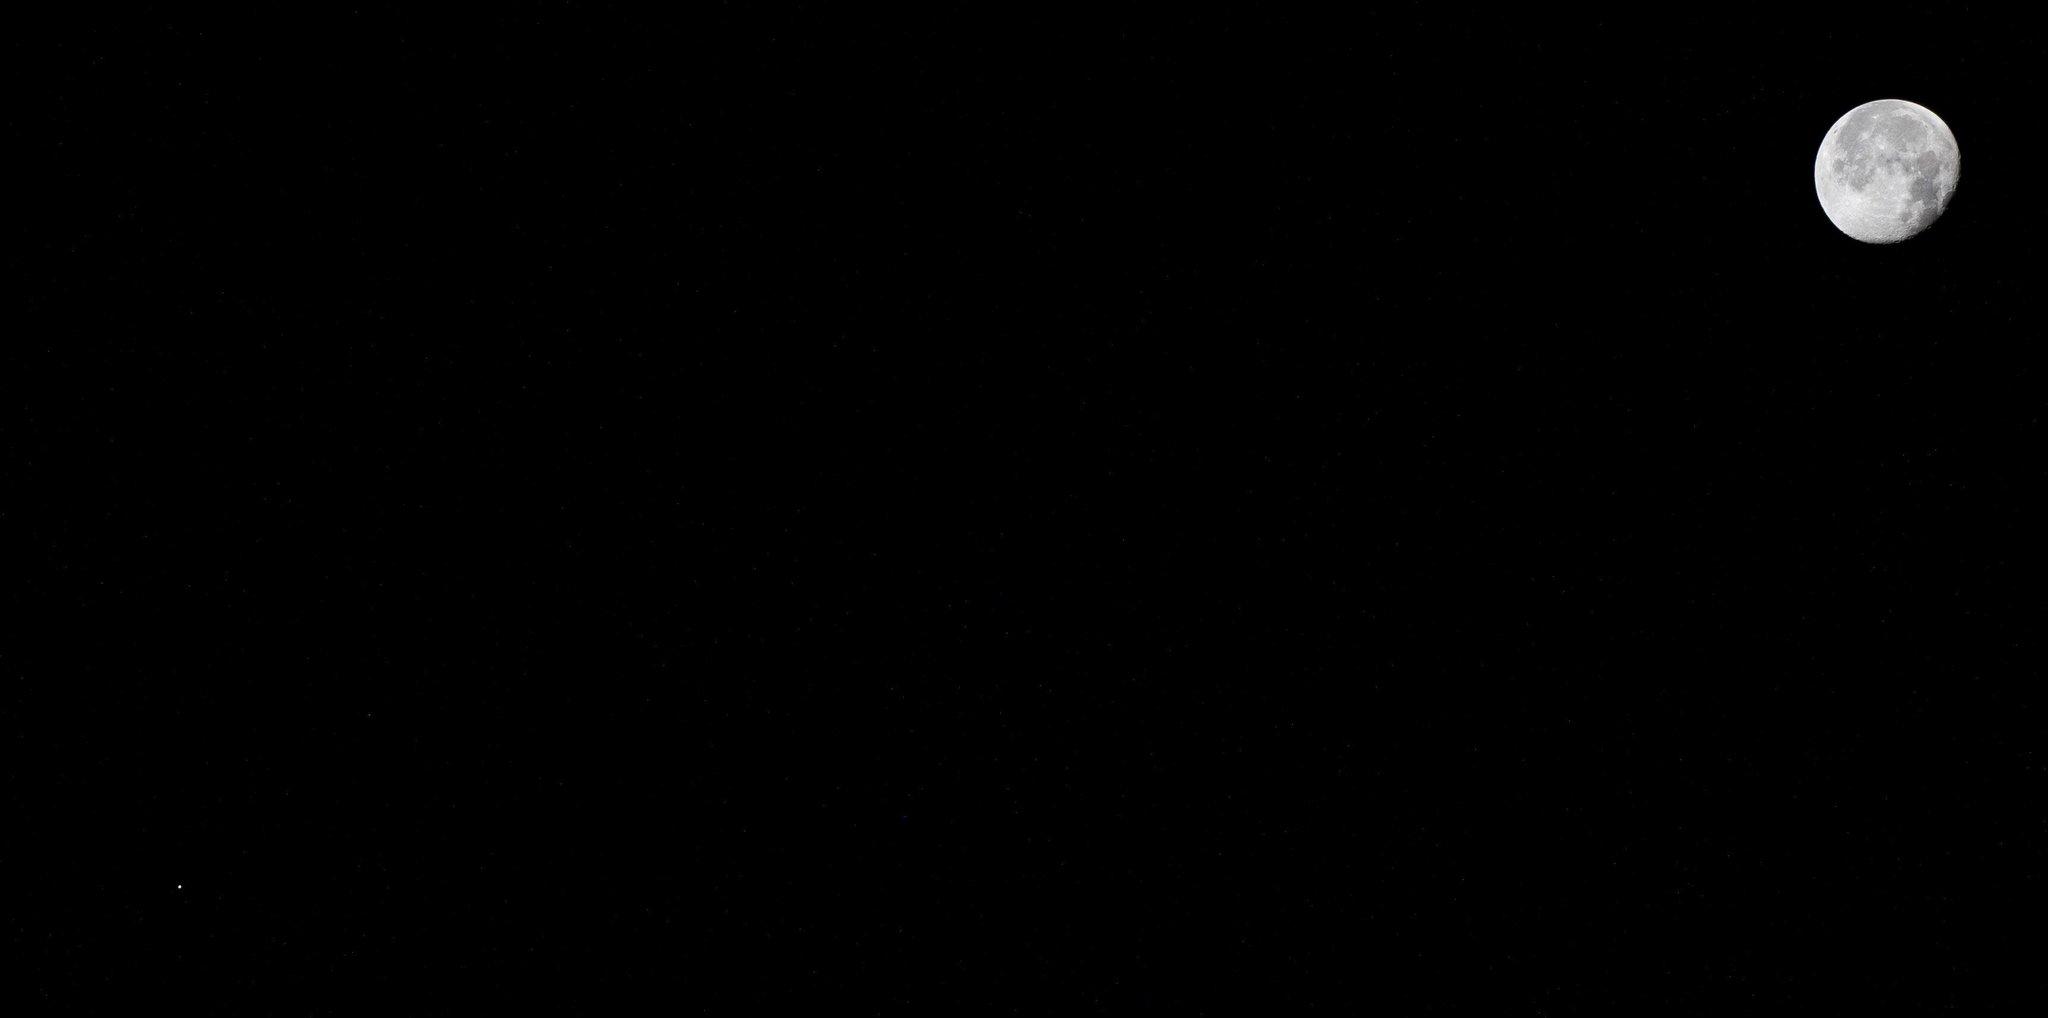 [ISS] Expédition  56 - Page 2 DjloxeFXoAEyPj4